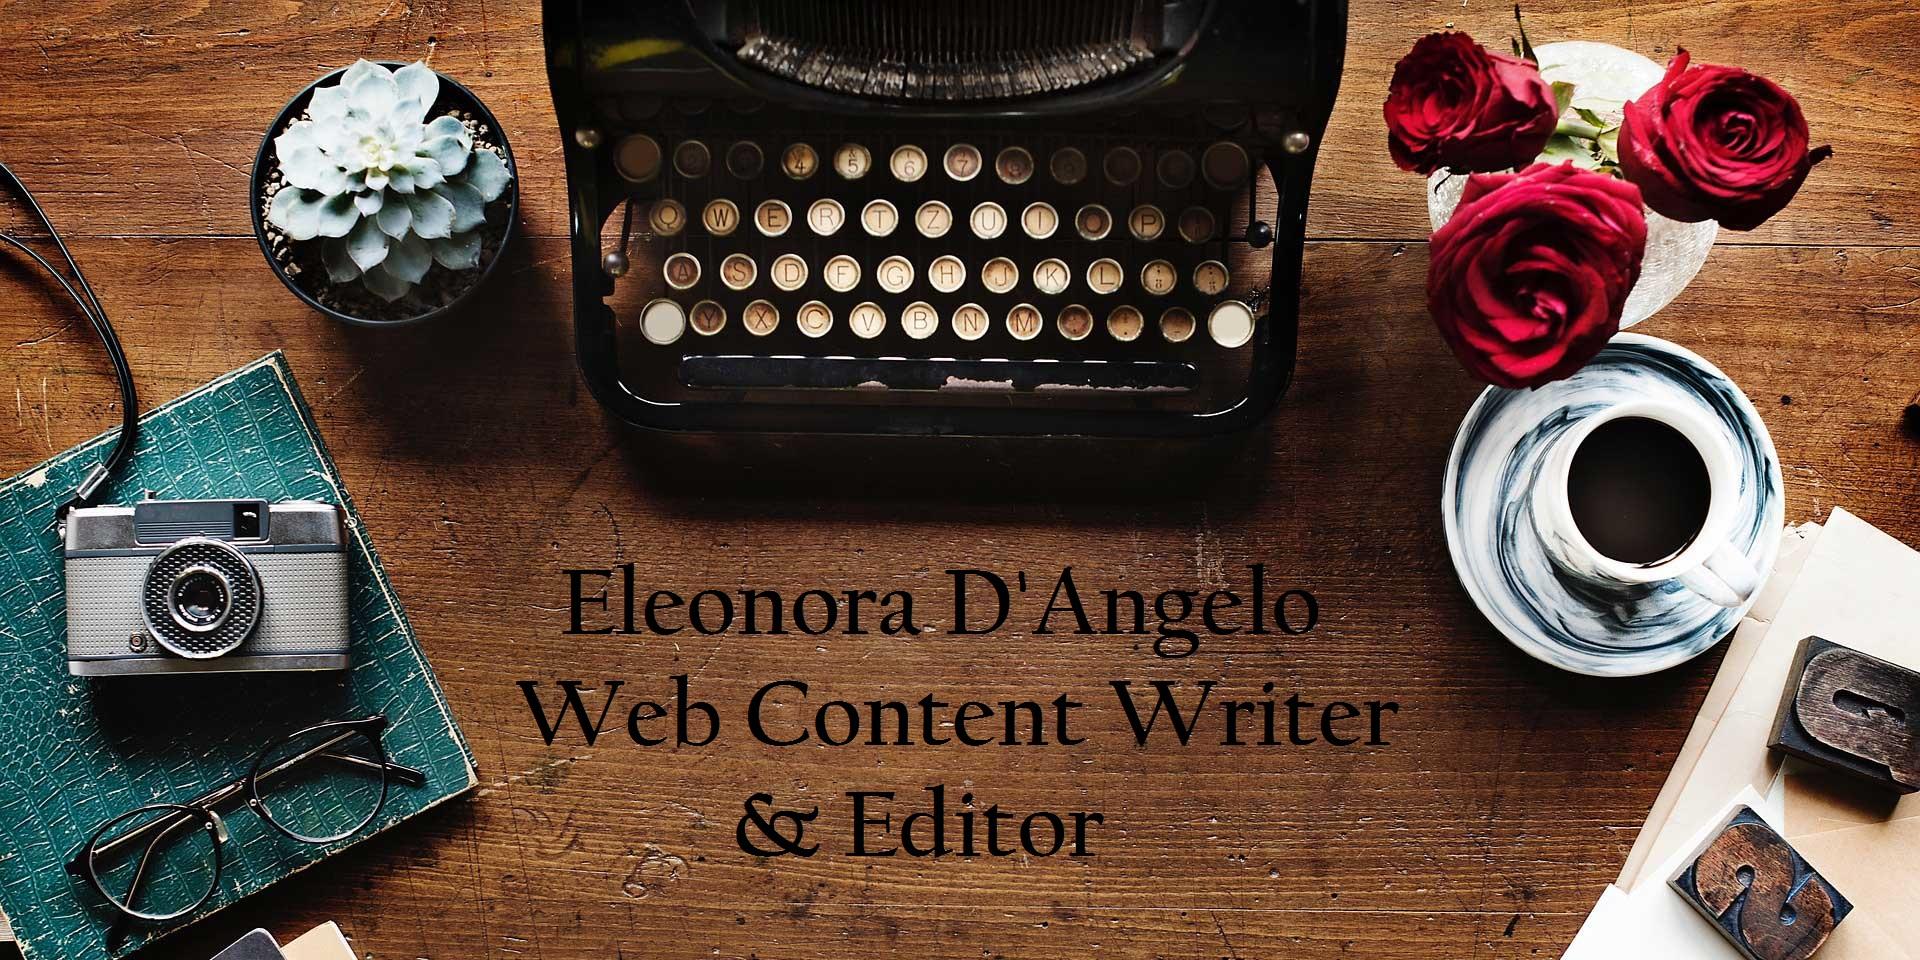 Eleonora D'Angelo web content editor Seo